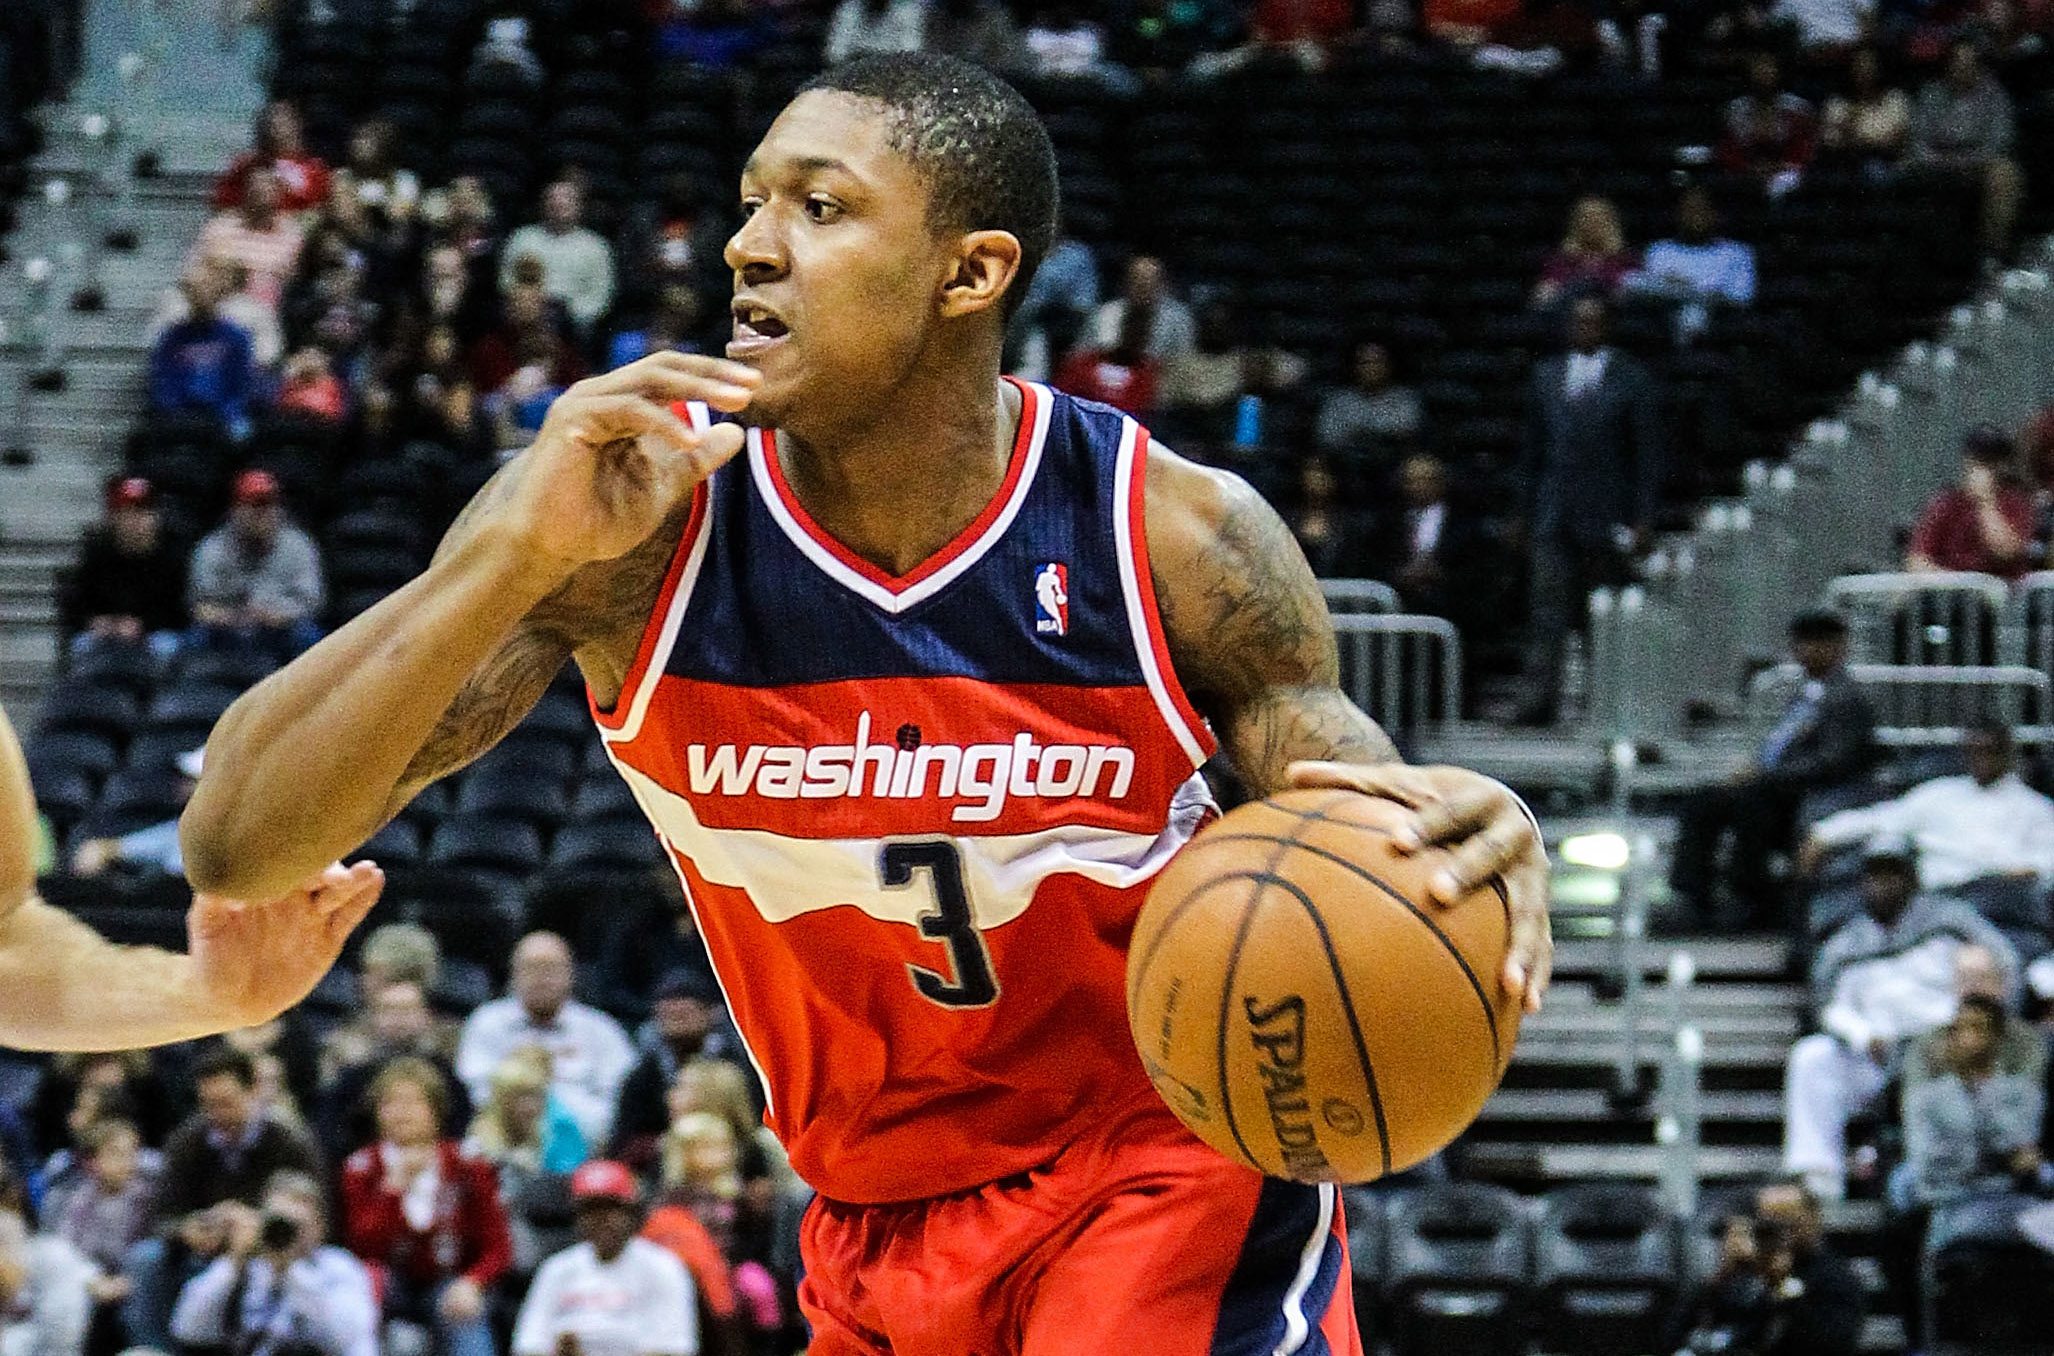 WASHINGTON WIZARDS nba basketball 9 wallpaper 2054x1356 226660 2054x1356